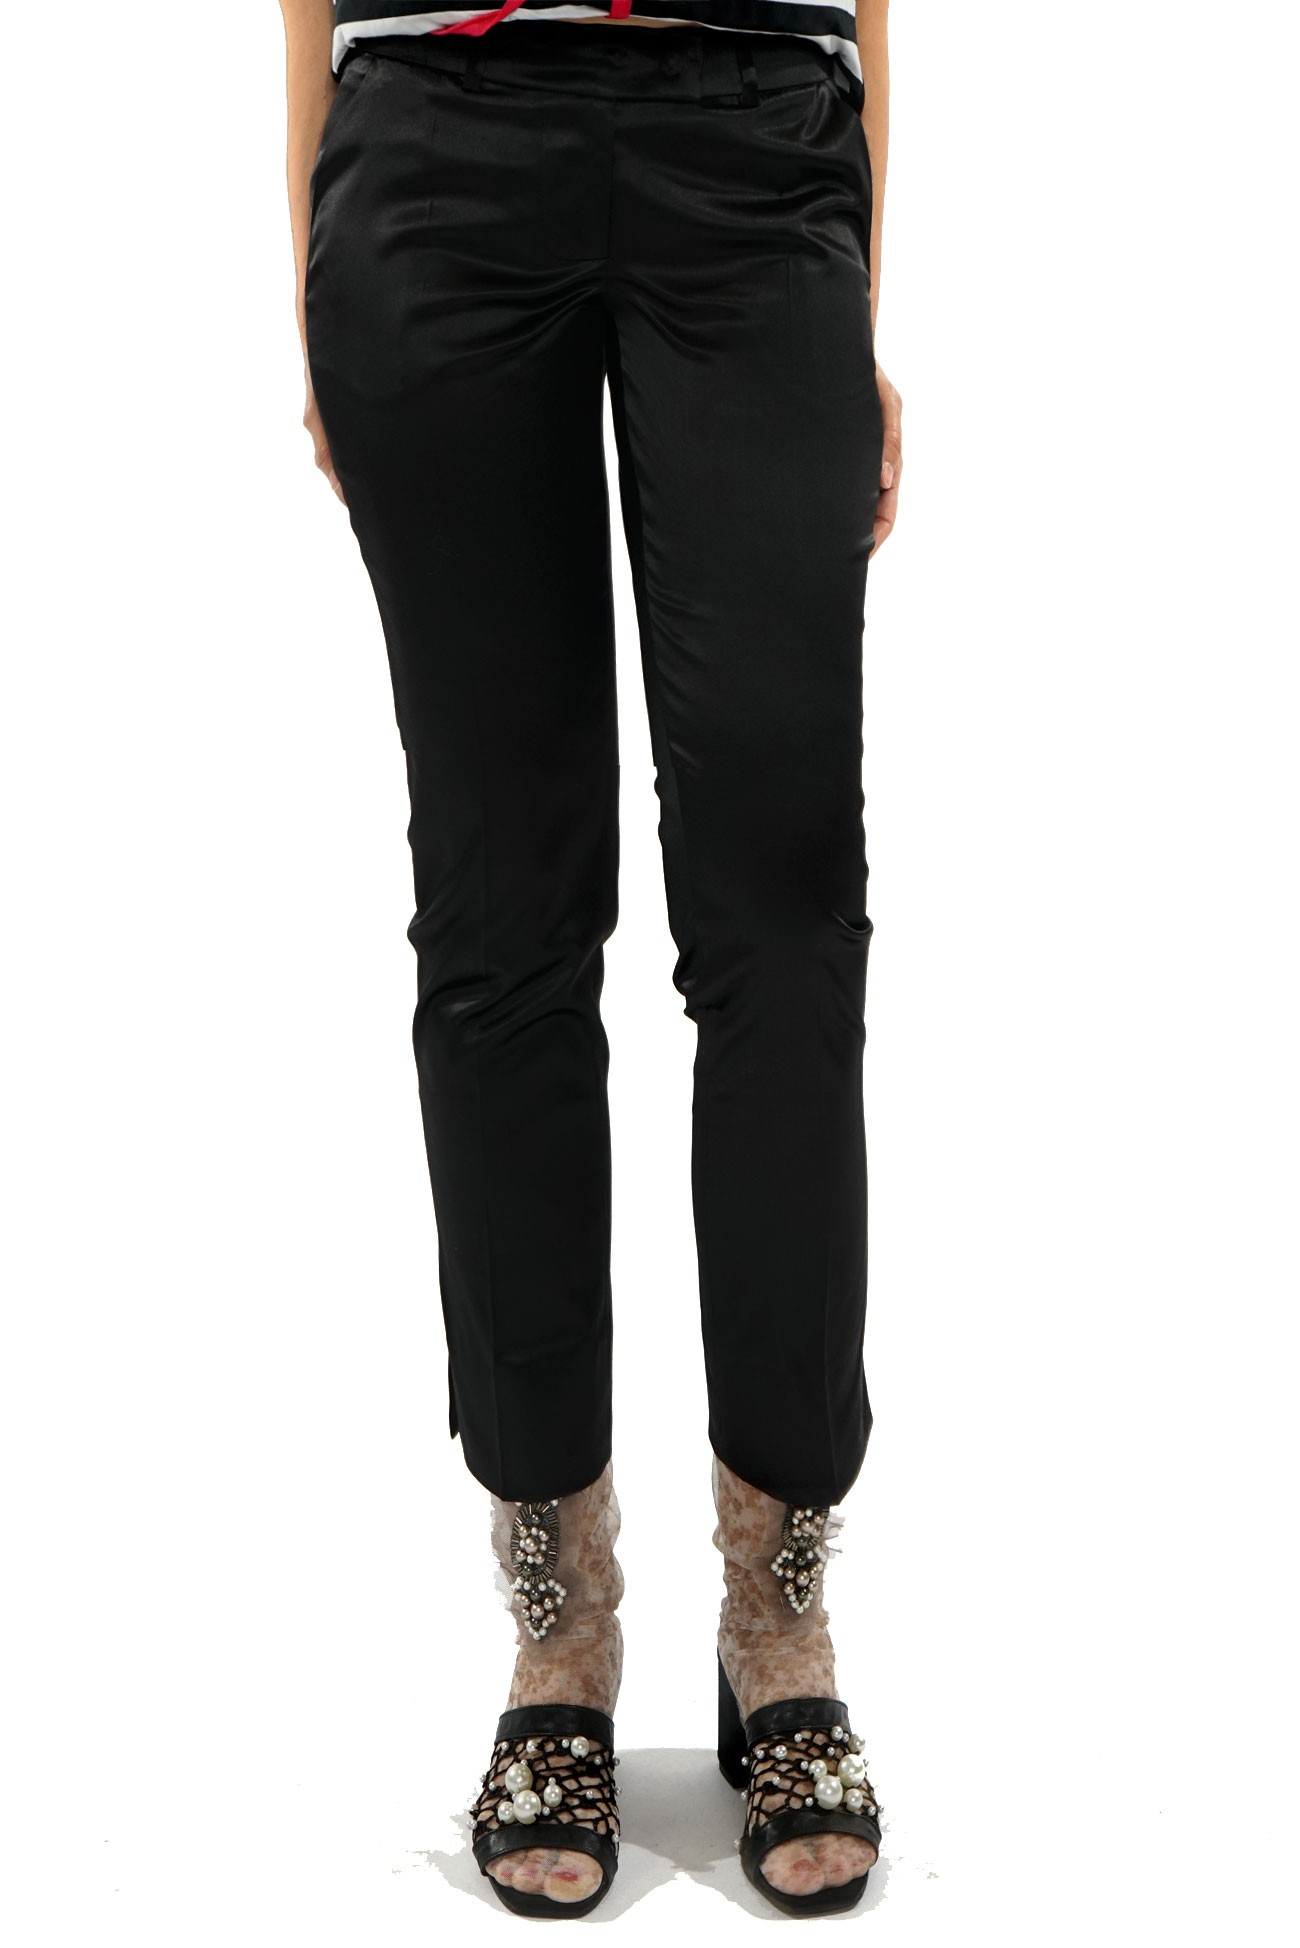 Pantalon conic negru